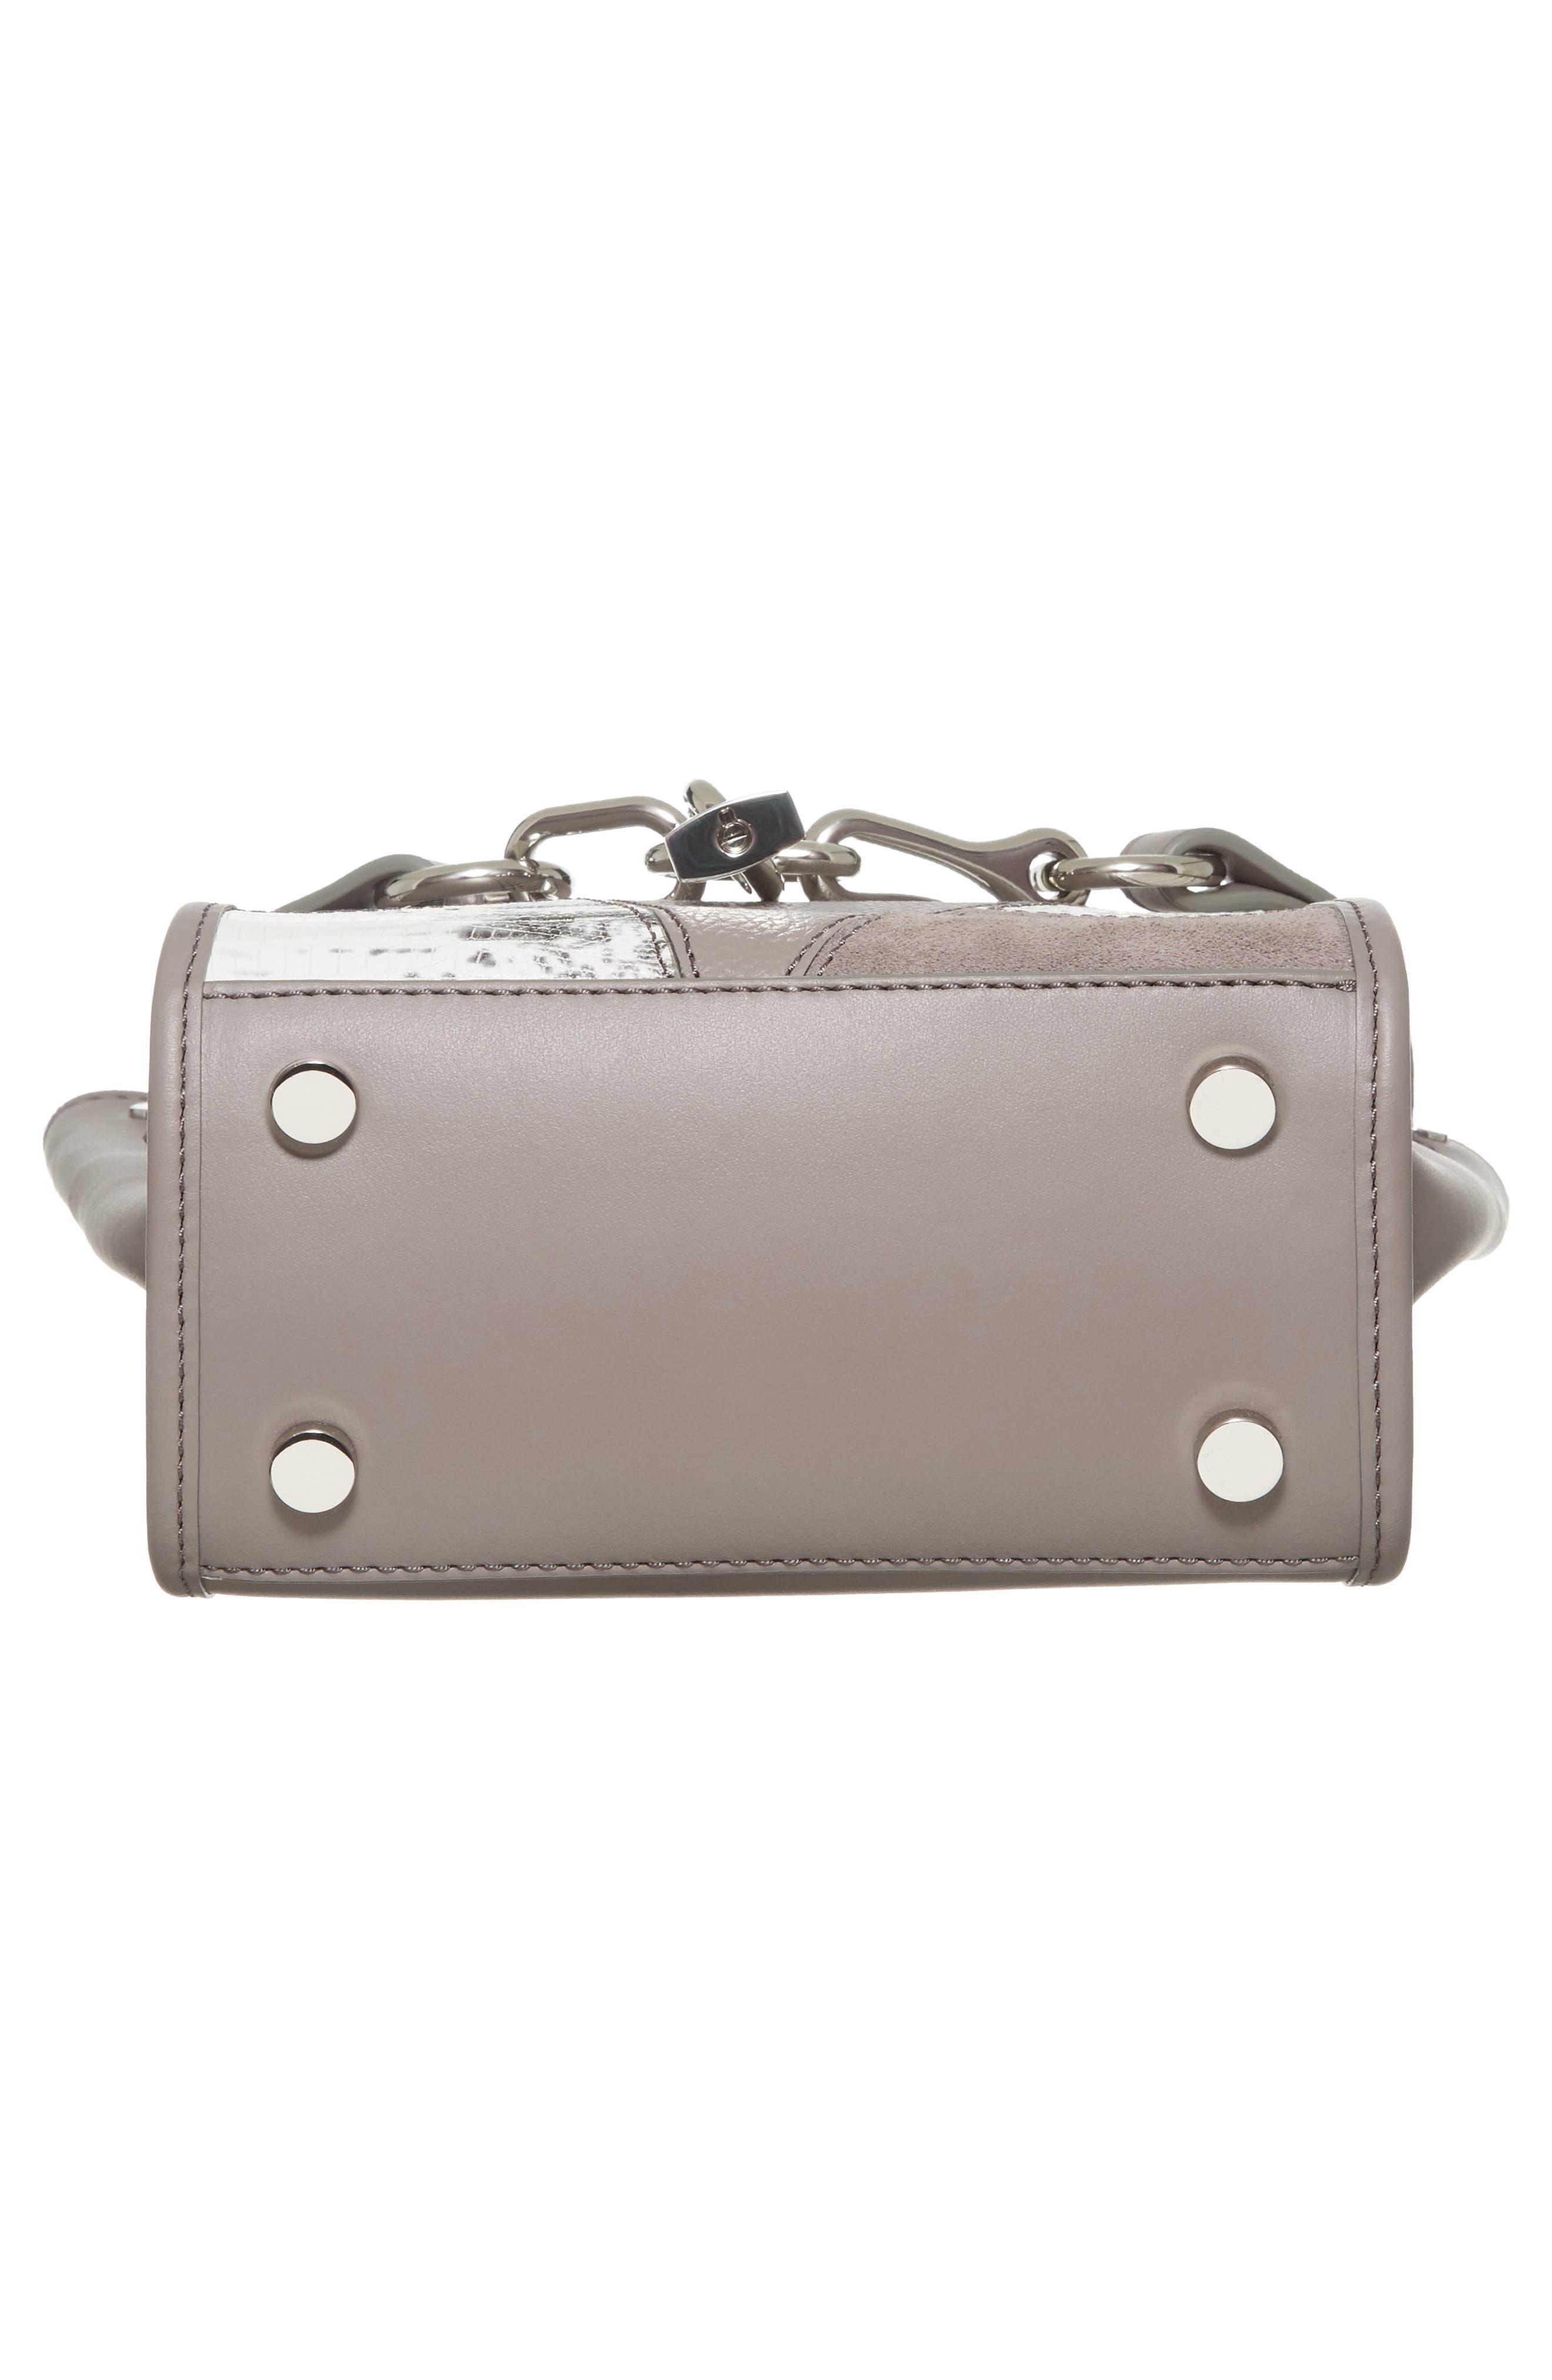 Mini Attica Patchwork Leather Satchel,                             Alternate thumbnail 6, color,                             Grey Multi